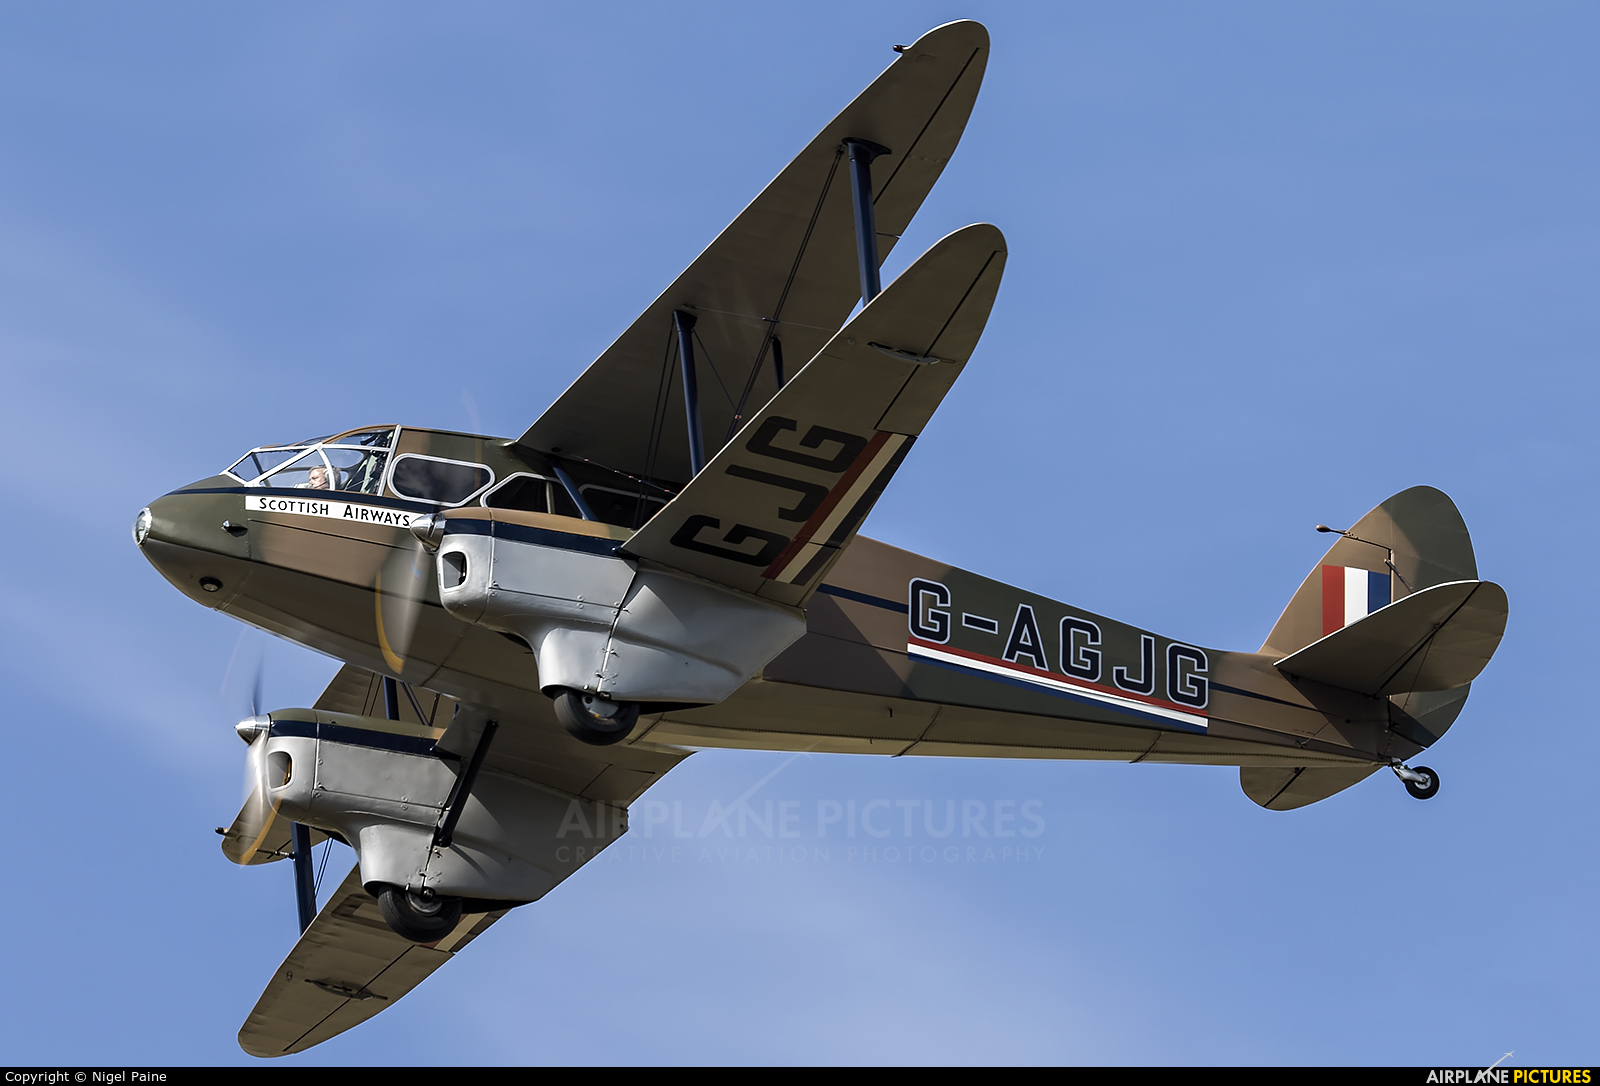 Private G-AGJG aircraft at Lashenden / Headcorn